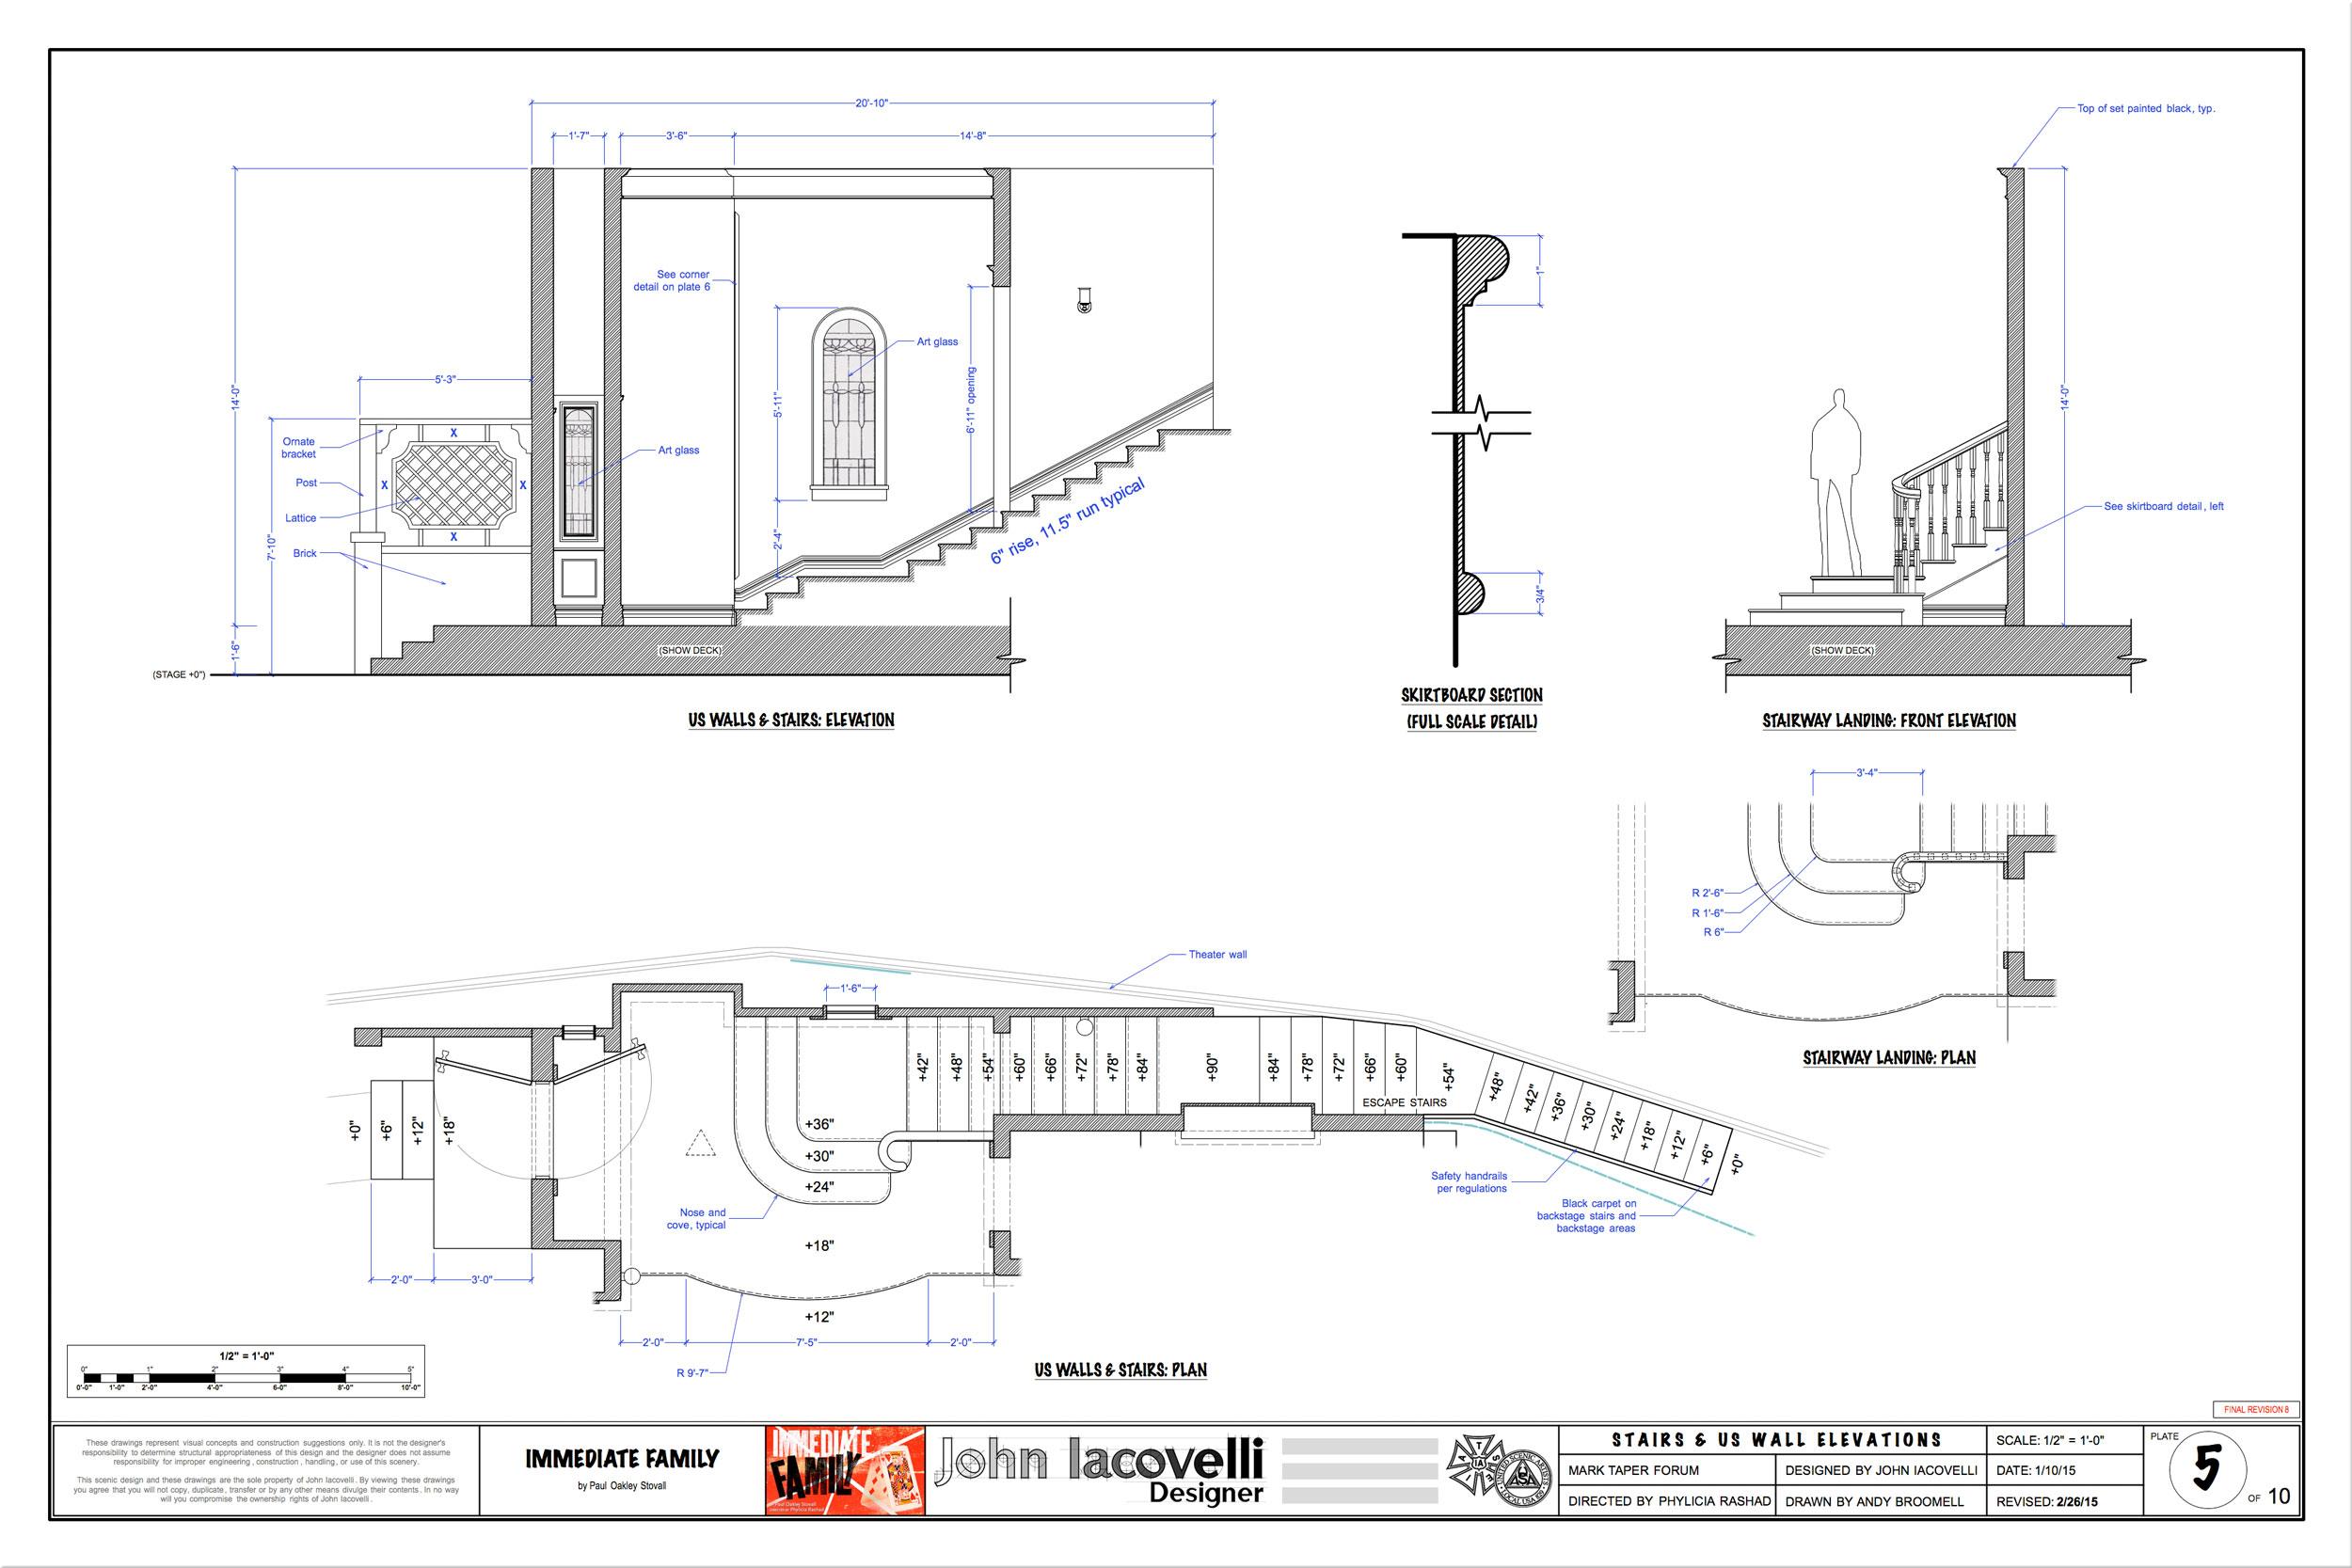 andy-broomell-scenic-design-drafting-immediate-family-5-vectorworks.jpg